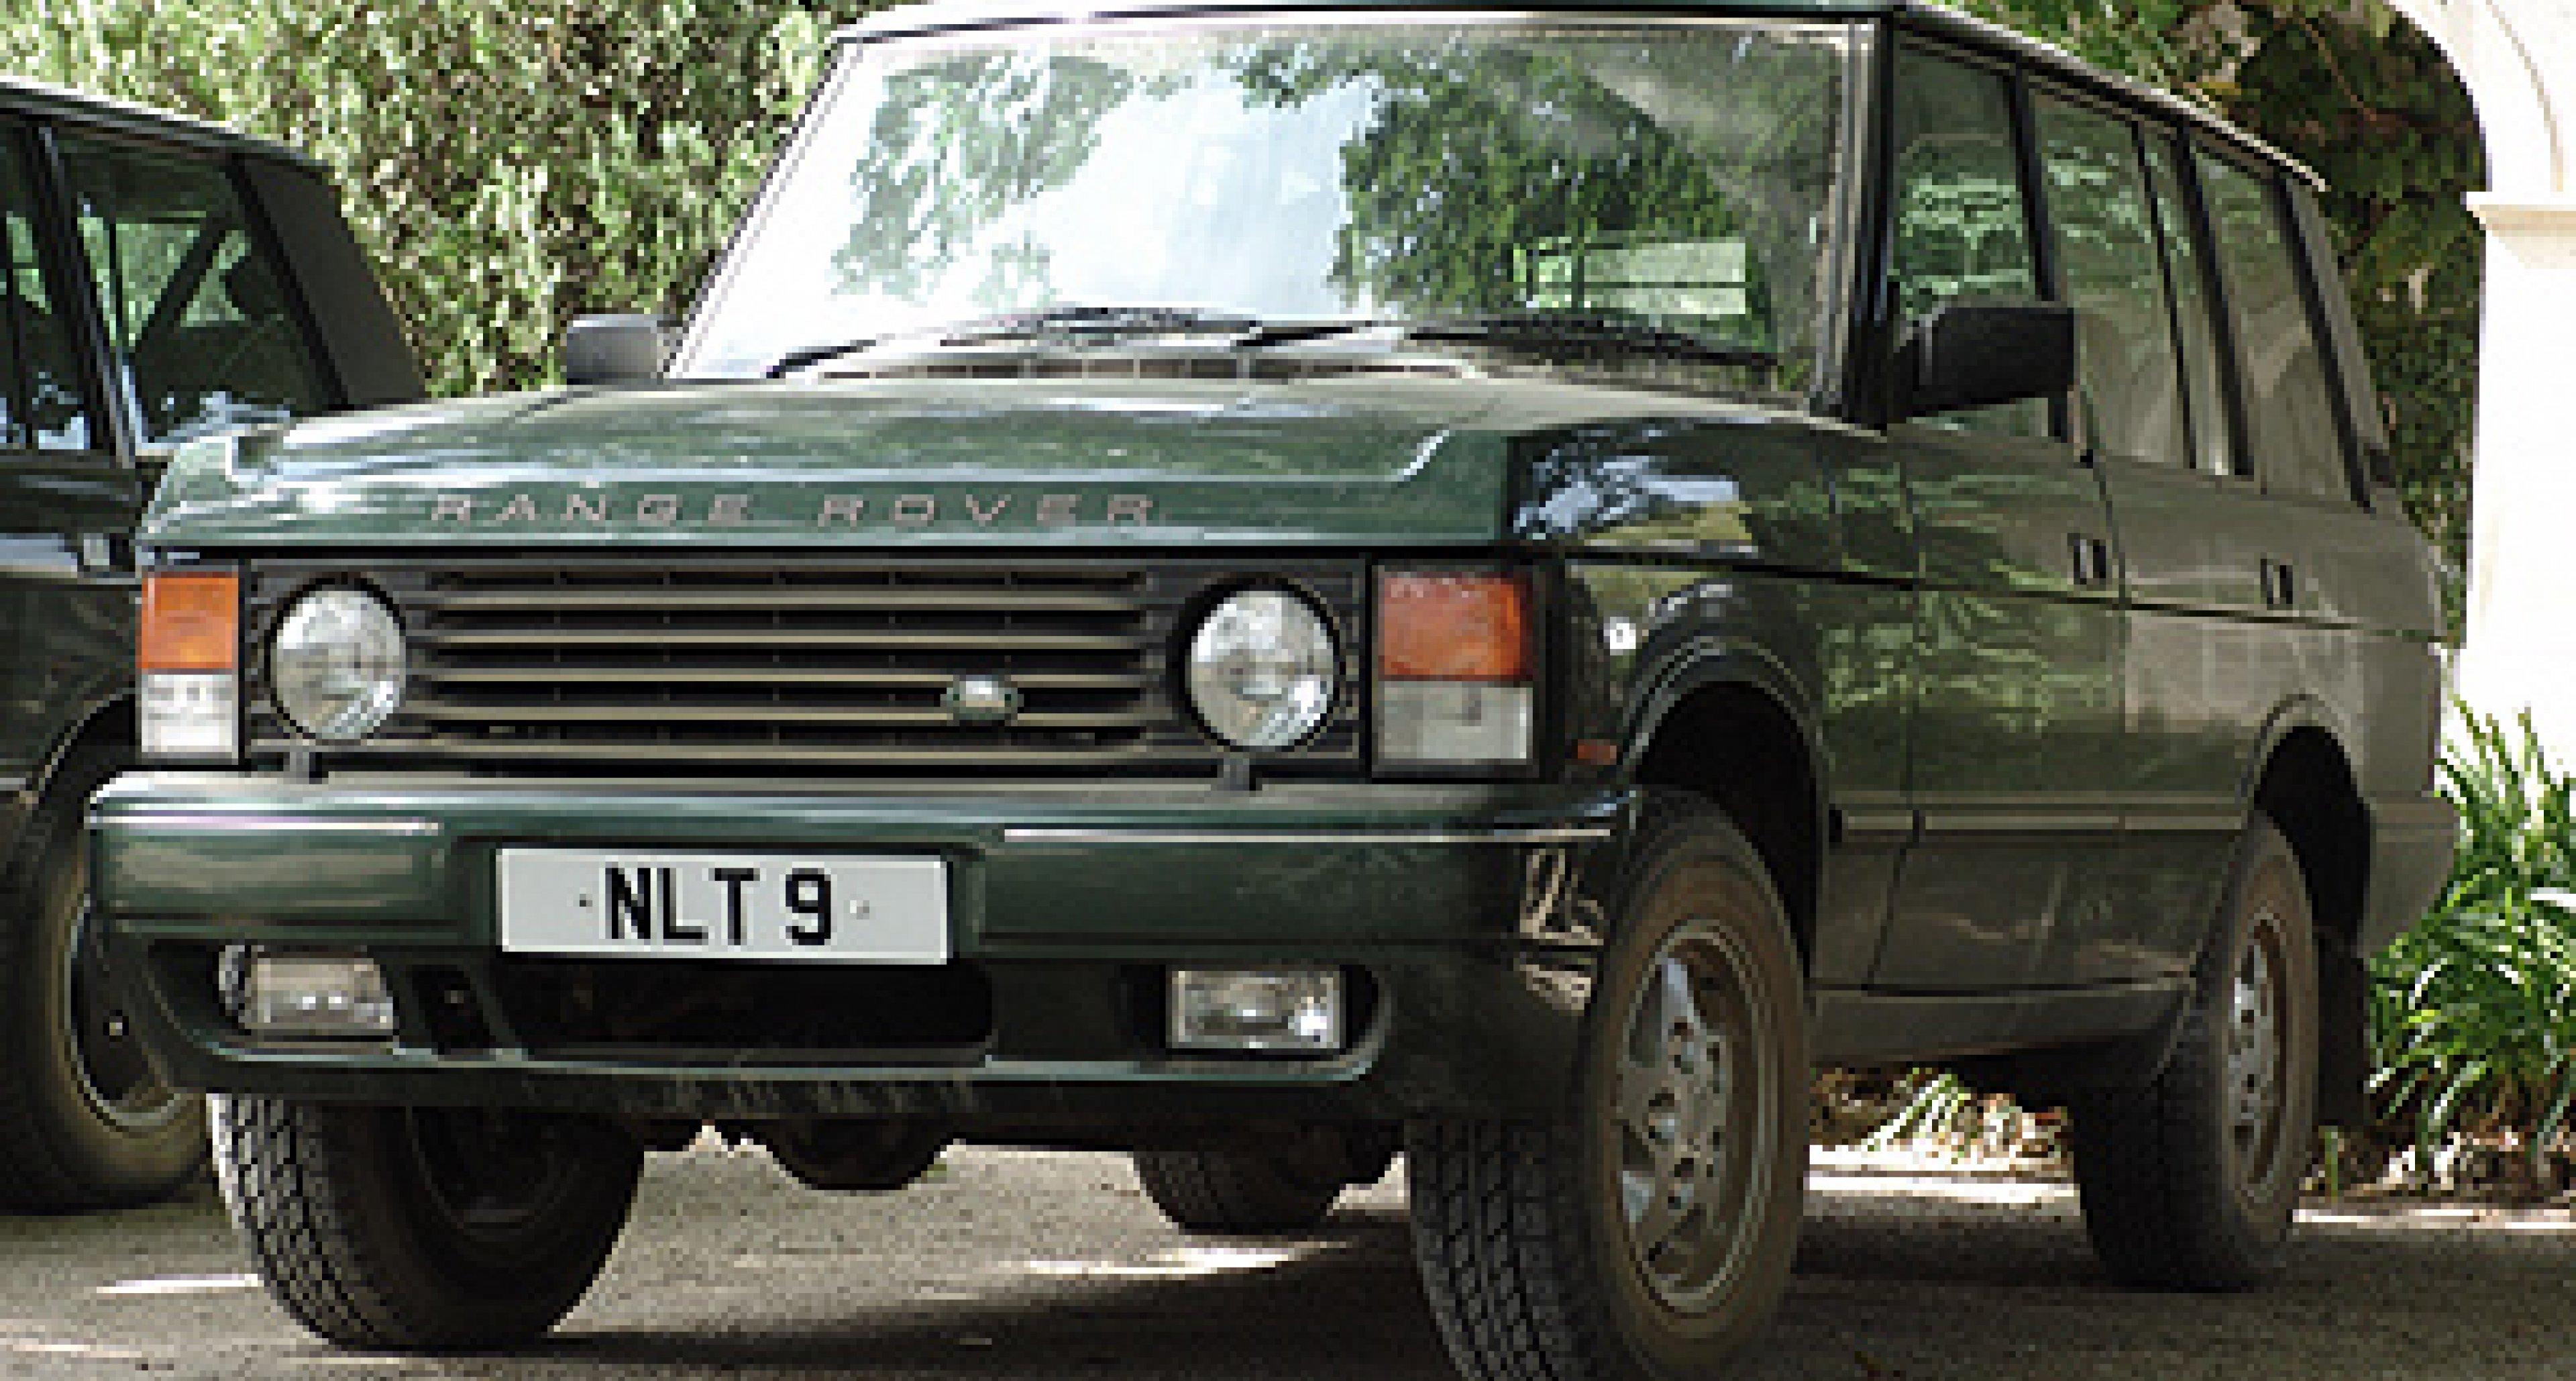 Range Rover Generationen